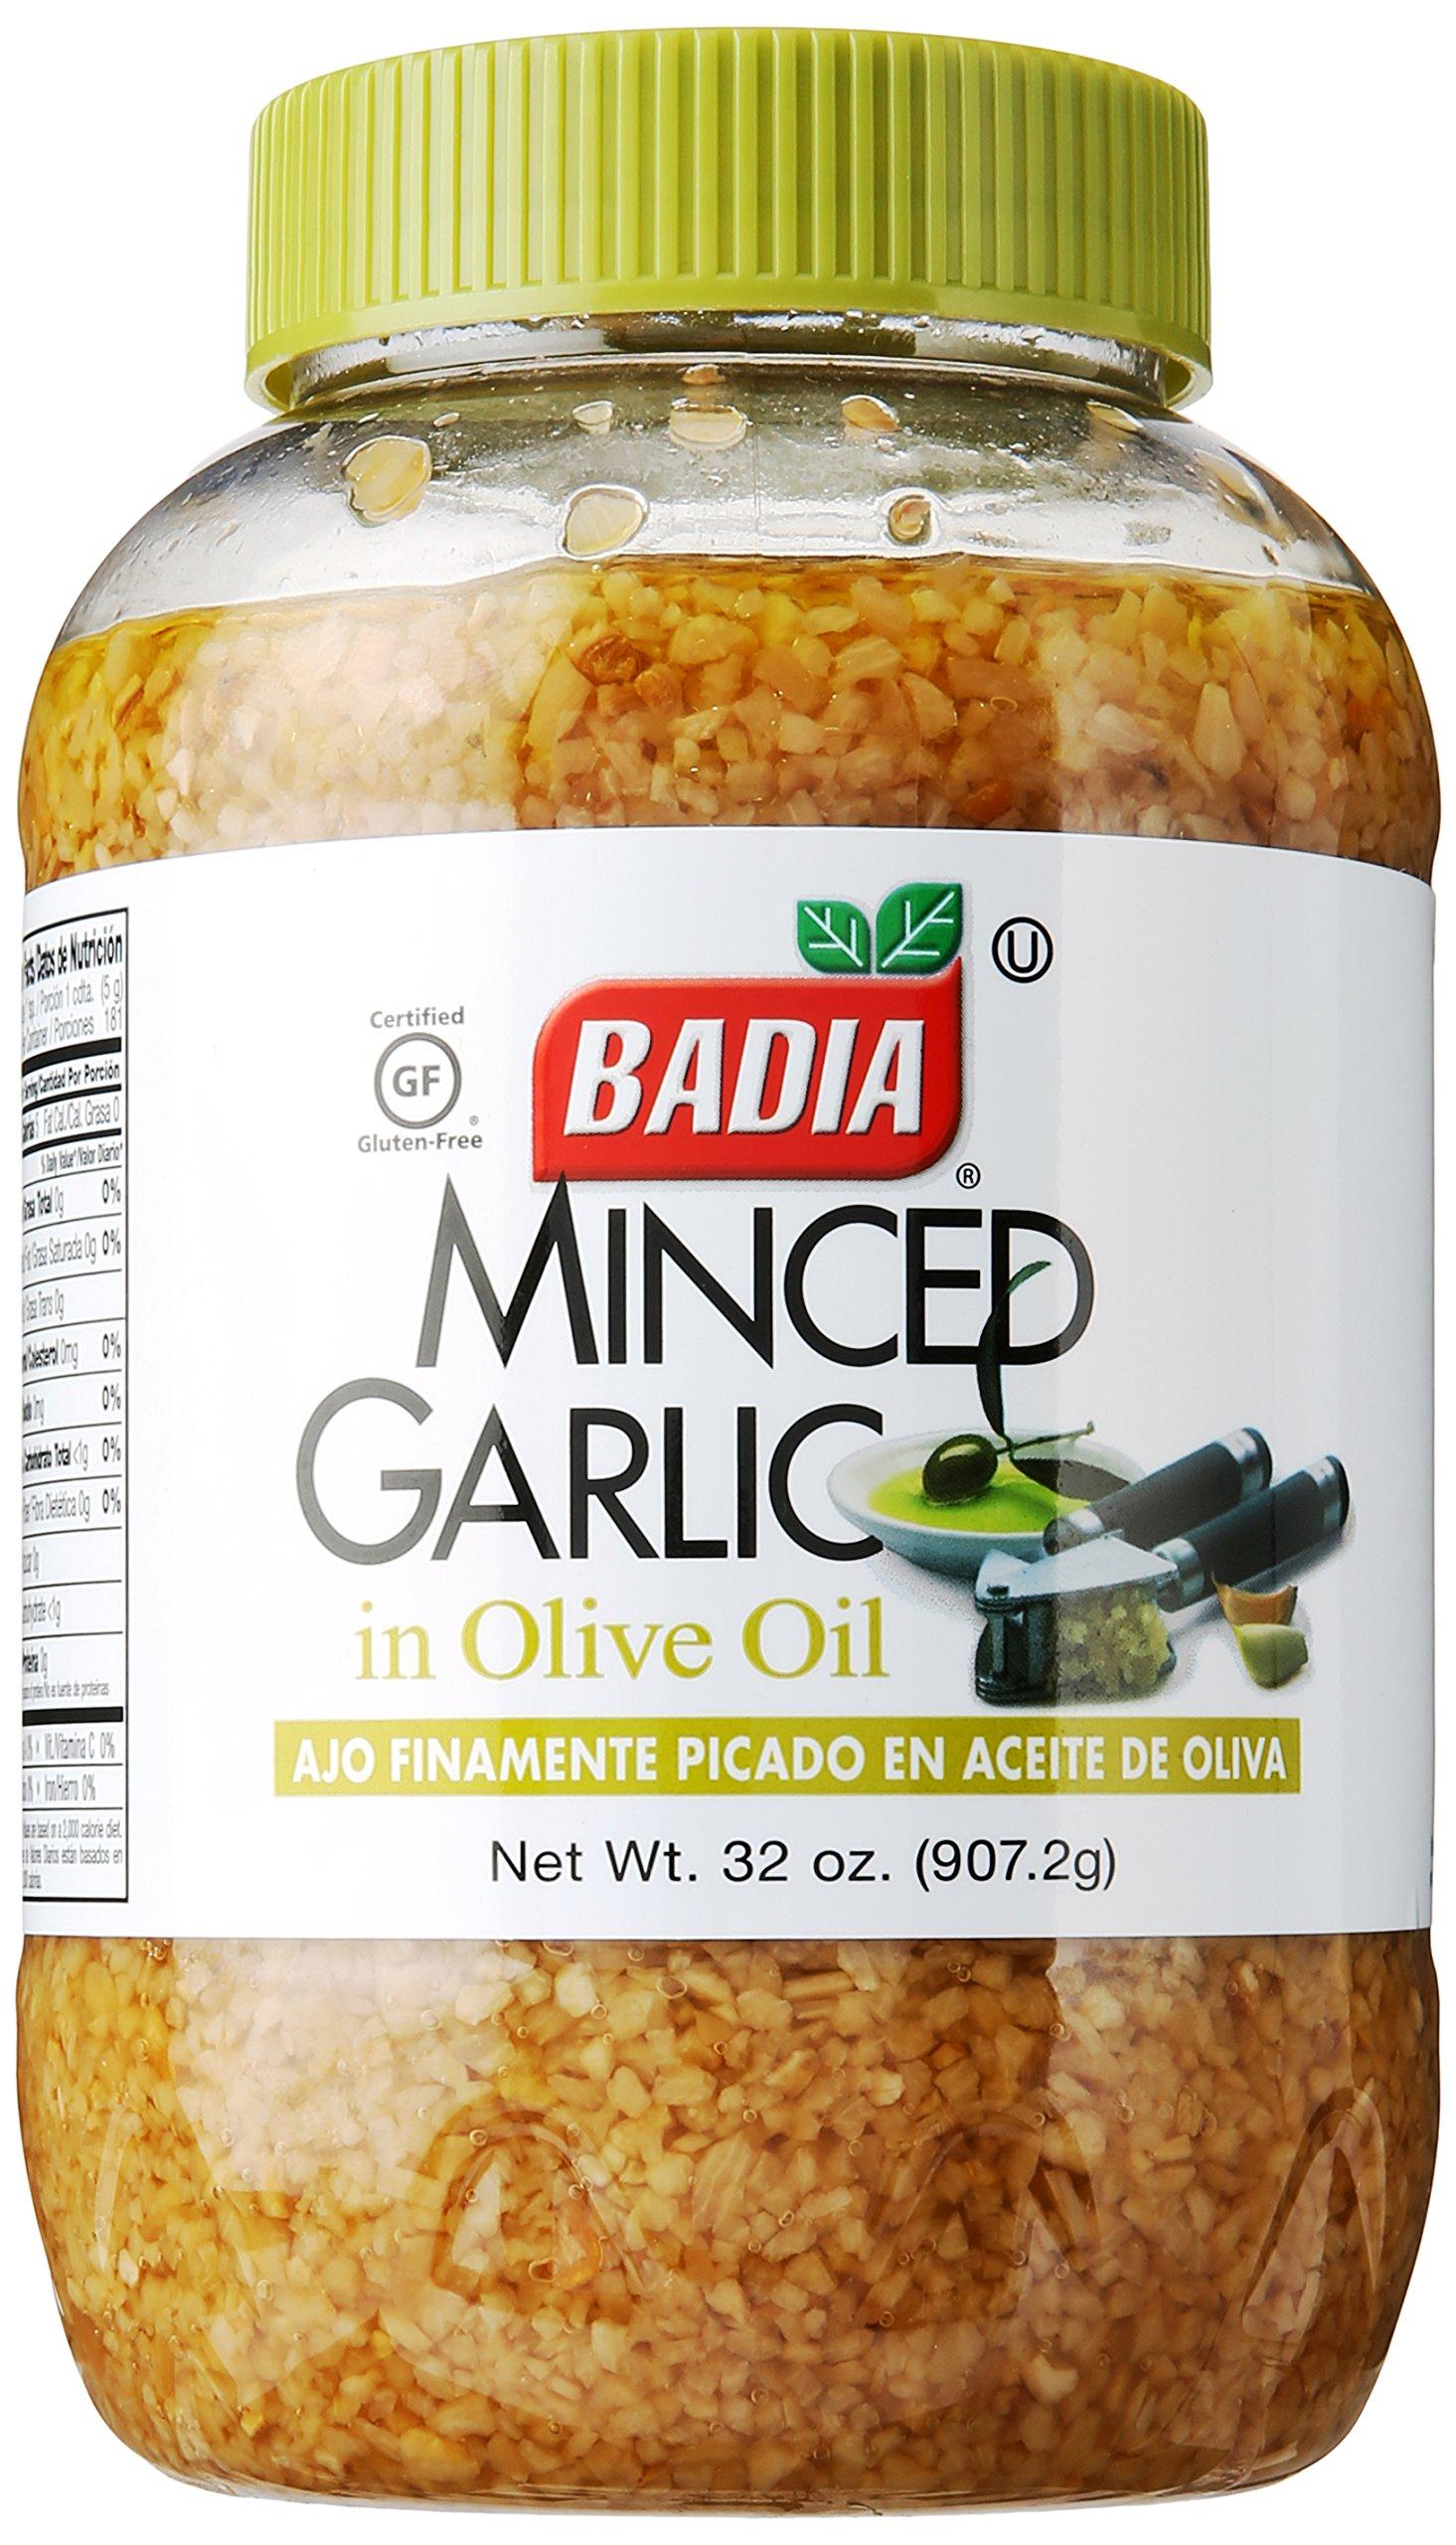 Badia Garlic Minced Oil, 32 oz by Badia (Image #1)